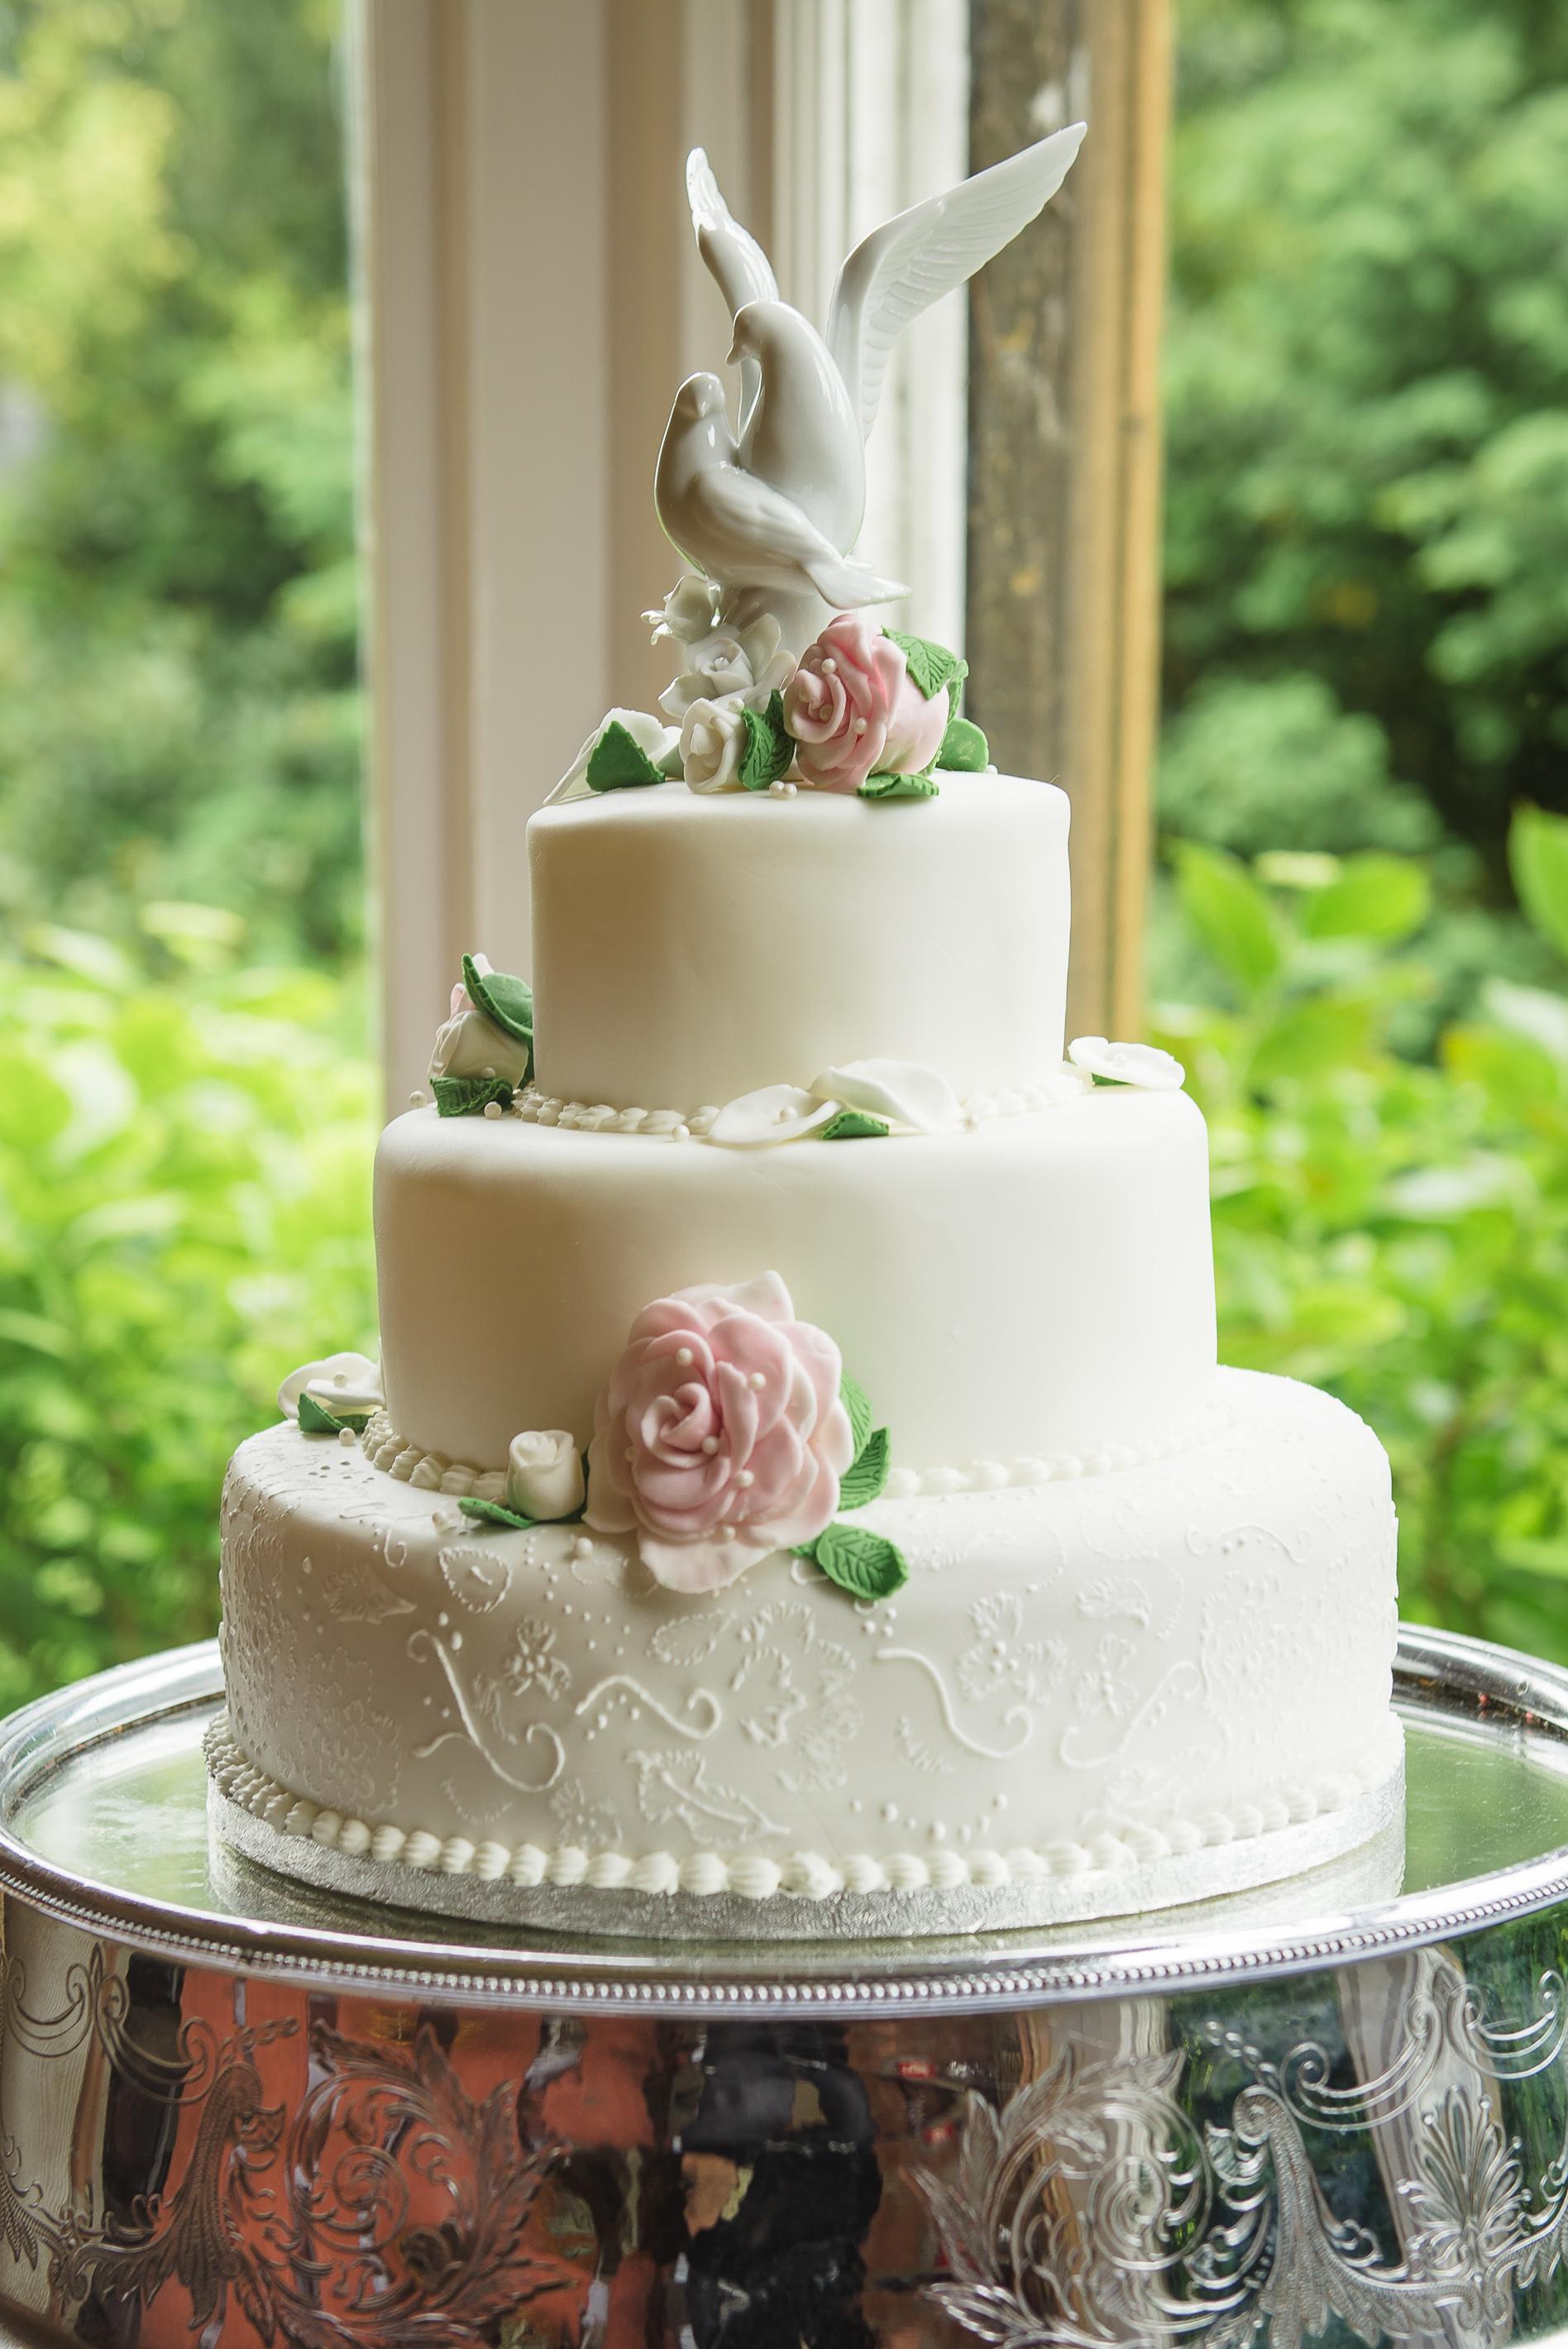 Wedding Cake in Kent Country House Wedding | Oakhouse Photography